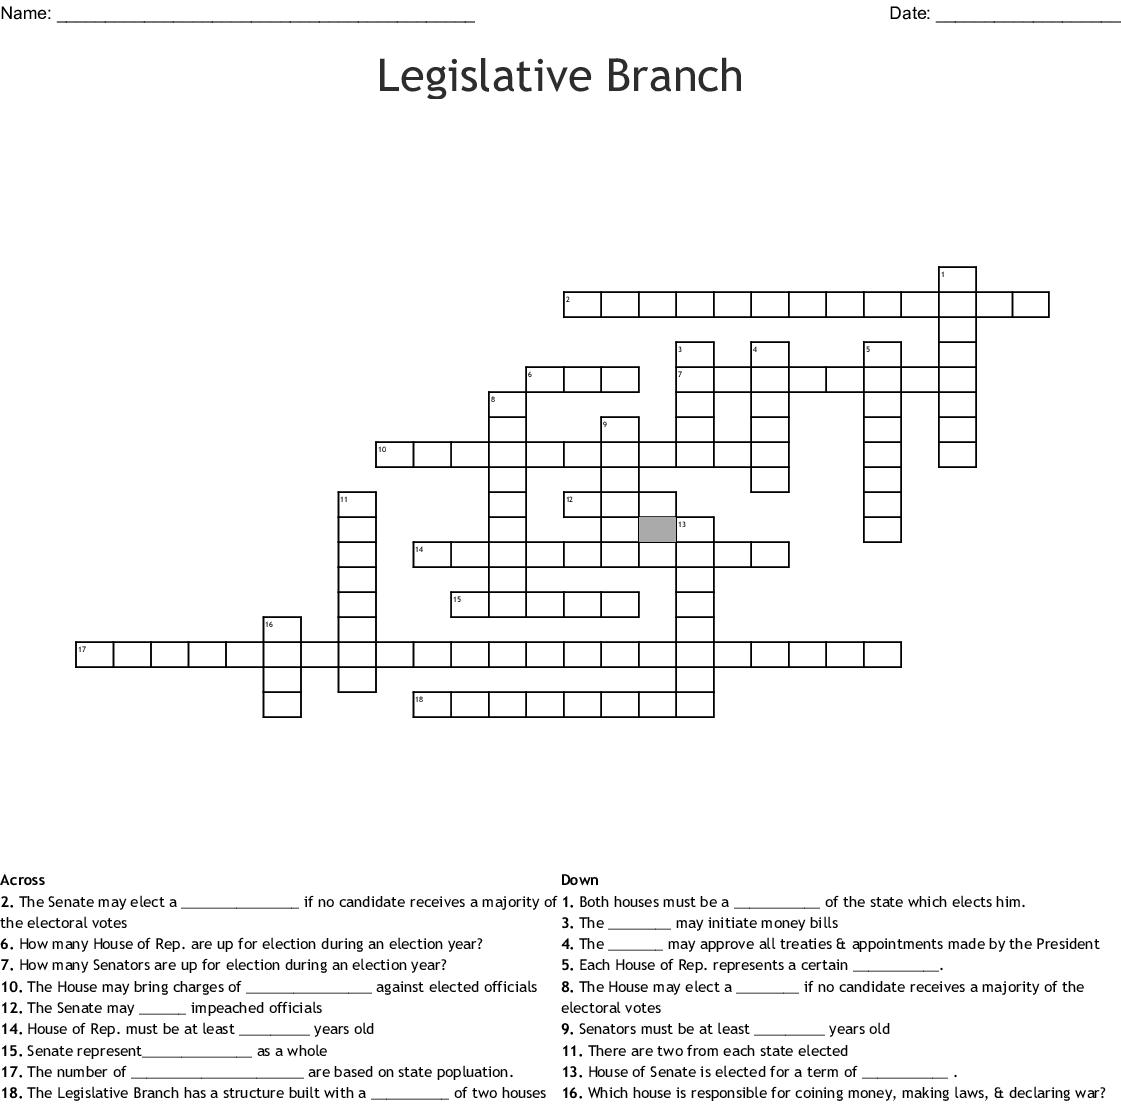 The Legislative Branch Crossword Word Db Excel